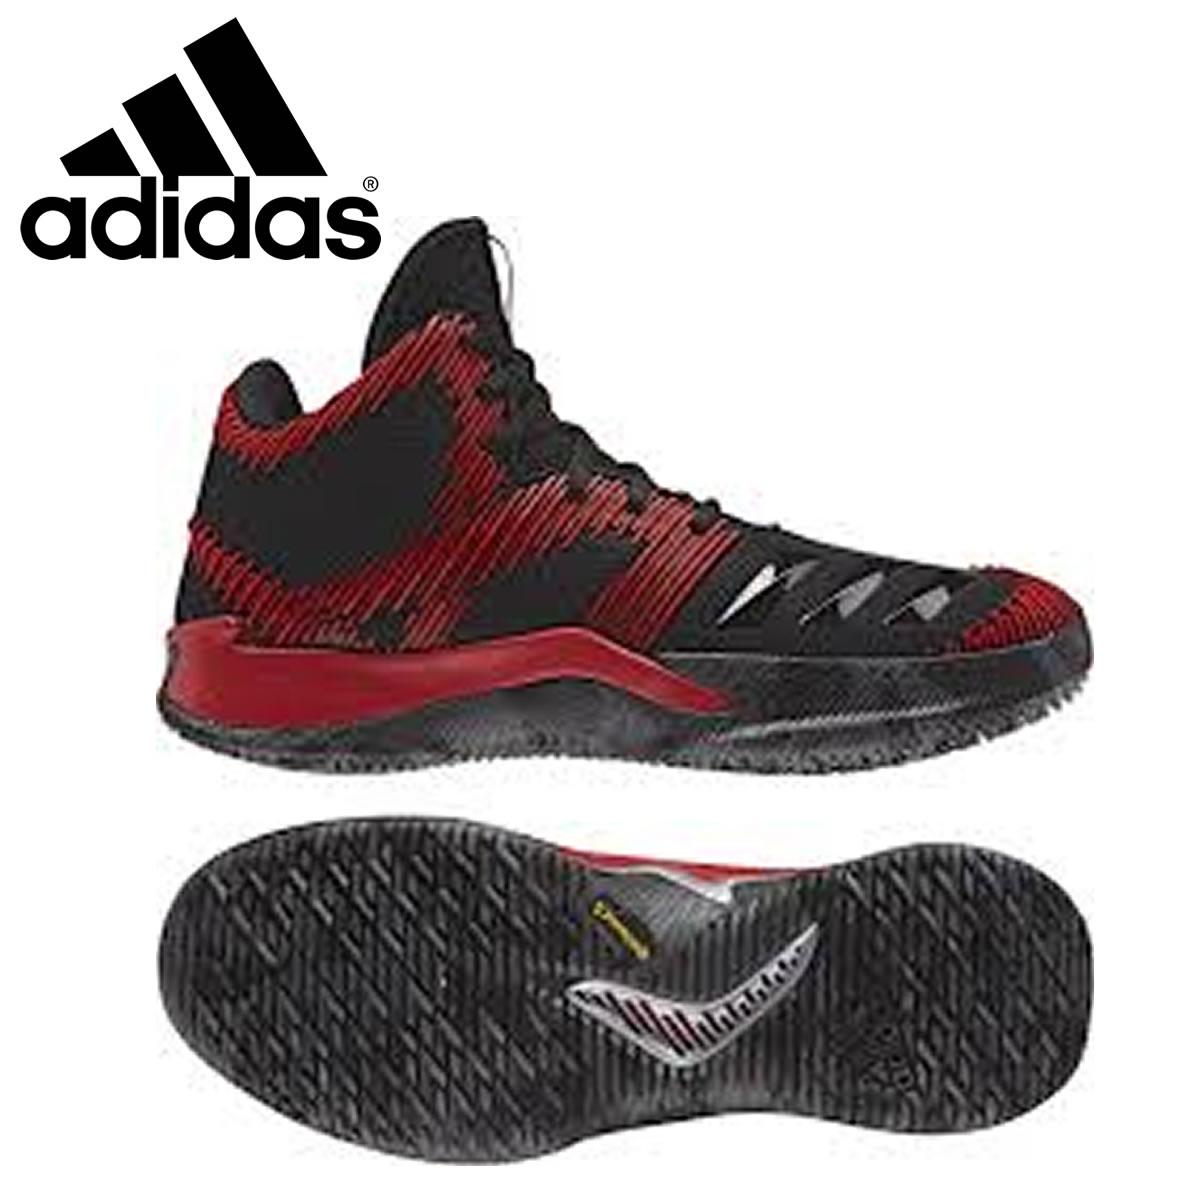 adidas BB8188 SPG(ユニ/メンズ) バスケットボールシューズ アディダス